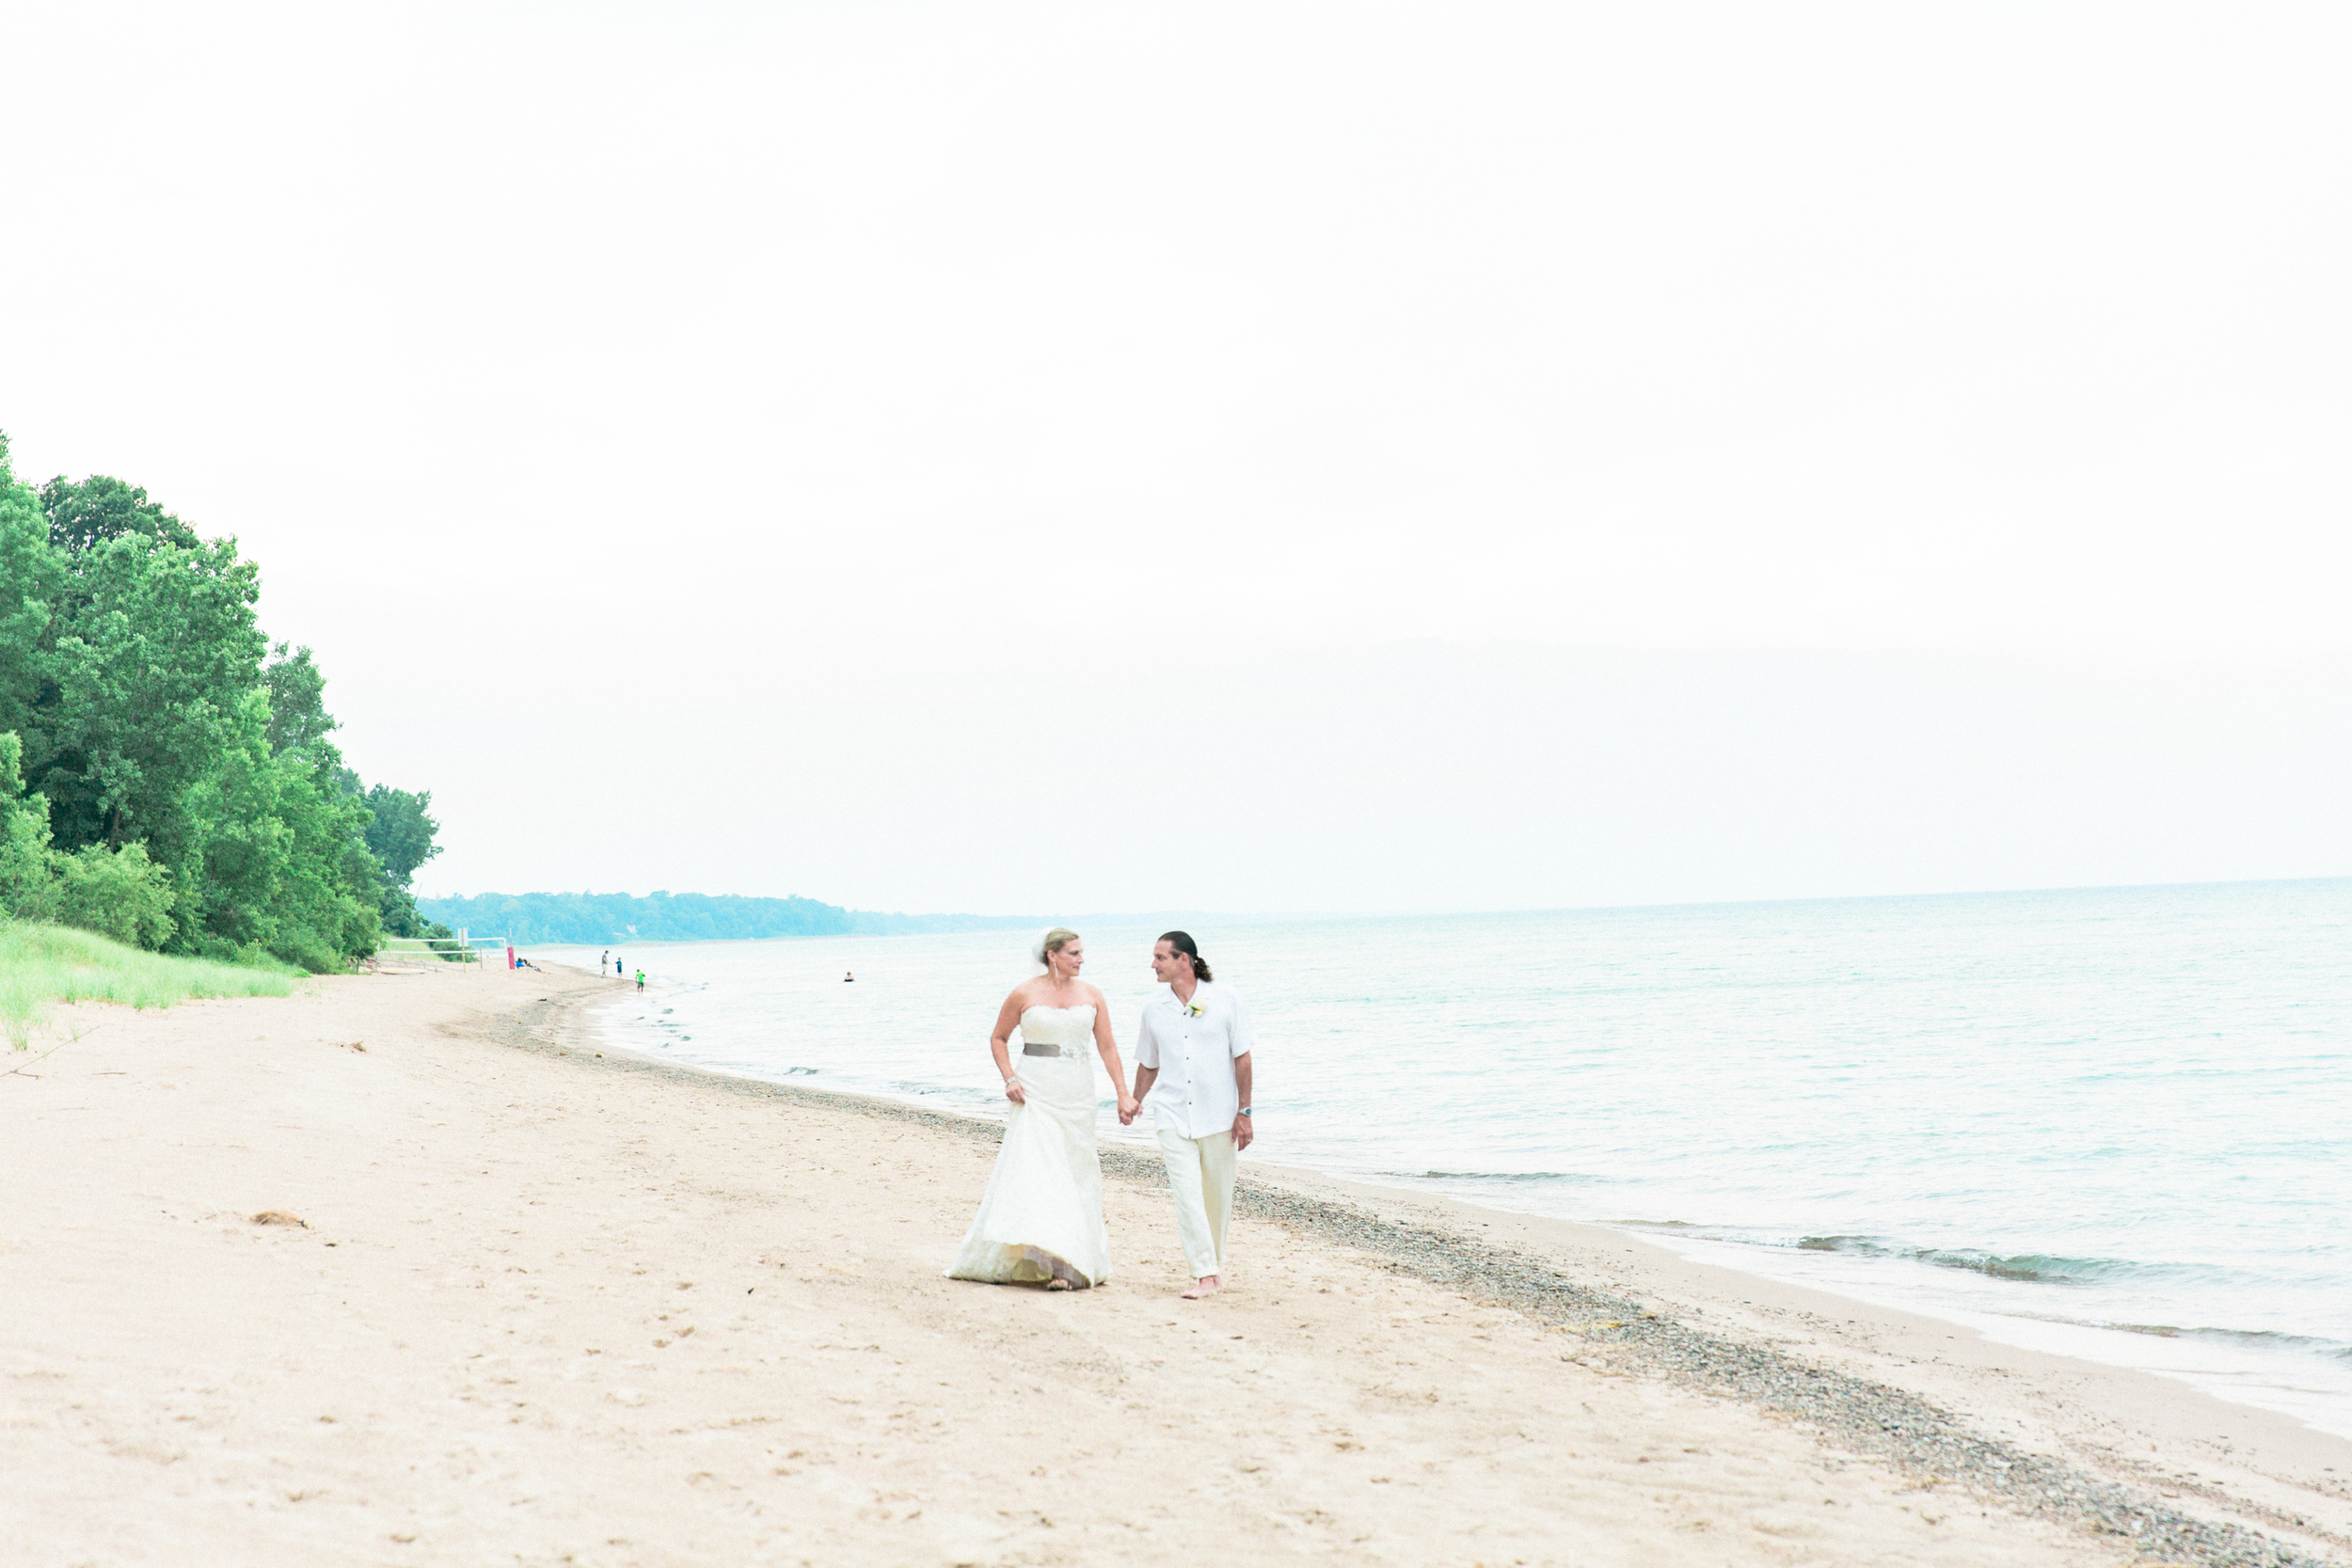 Bonphotage Midwest Wedding Photography